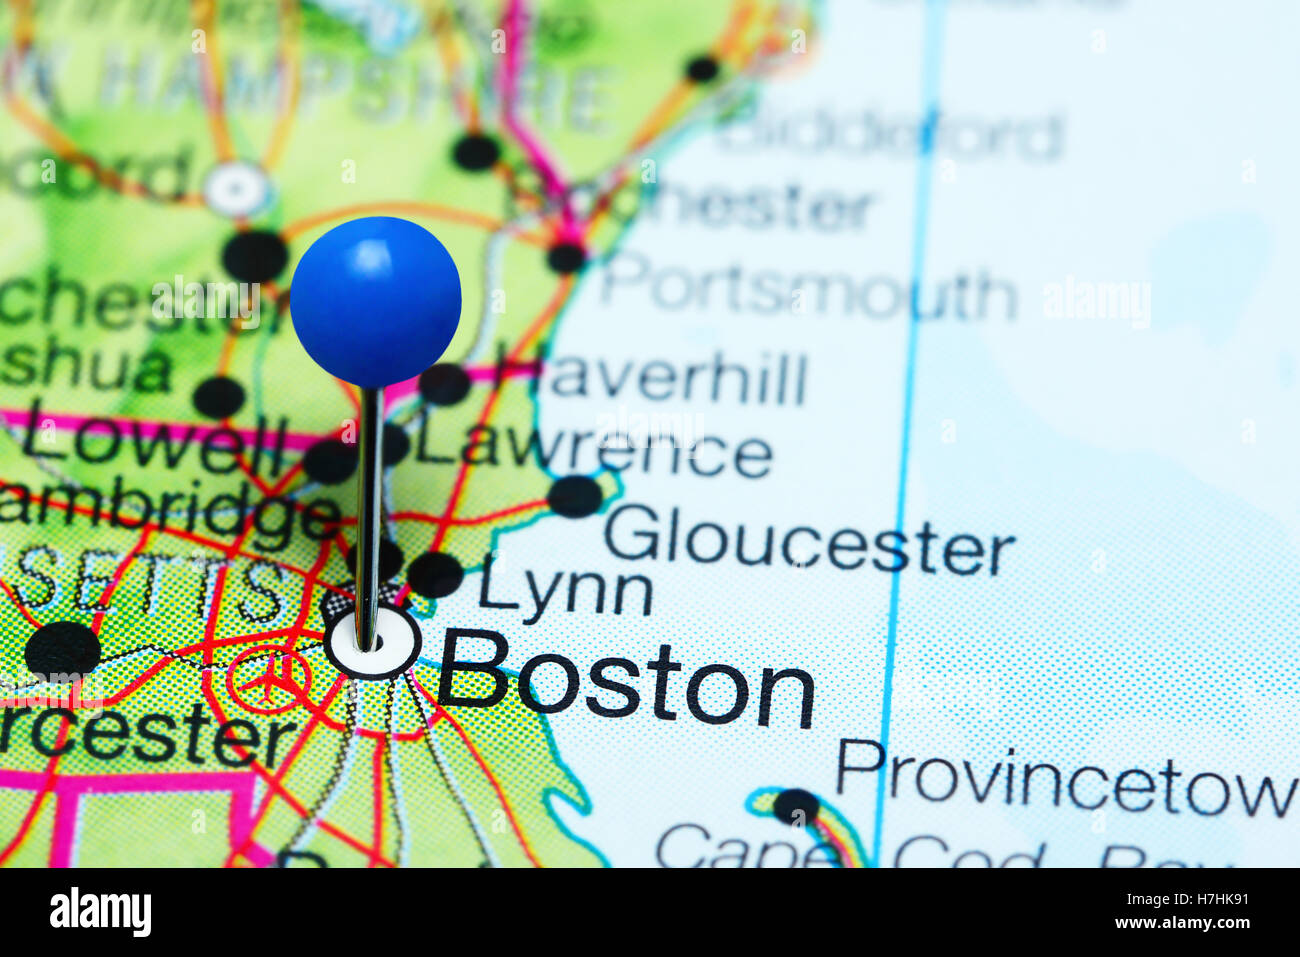 Boston Marked On The Map Of The Usa Stockfotos & Boston Marked On ...